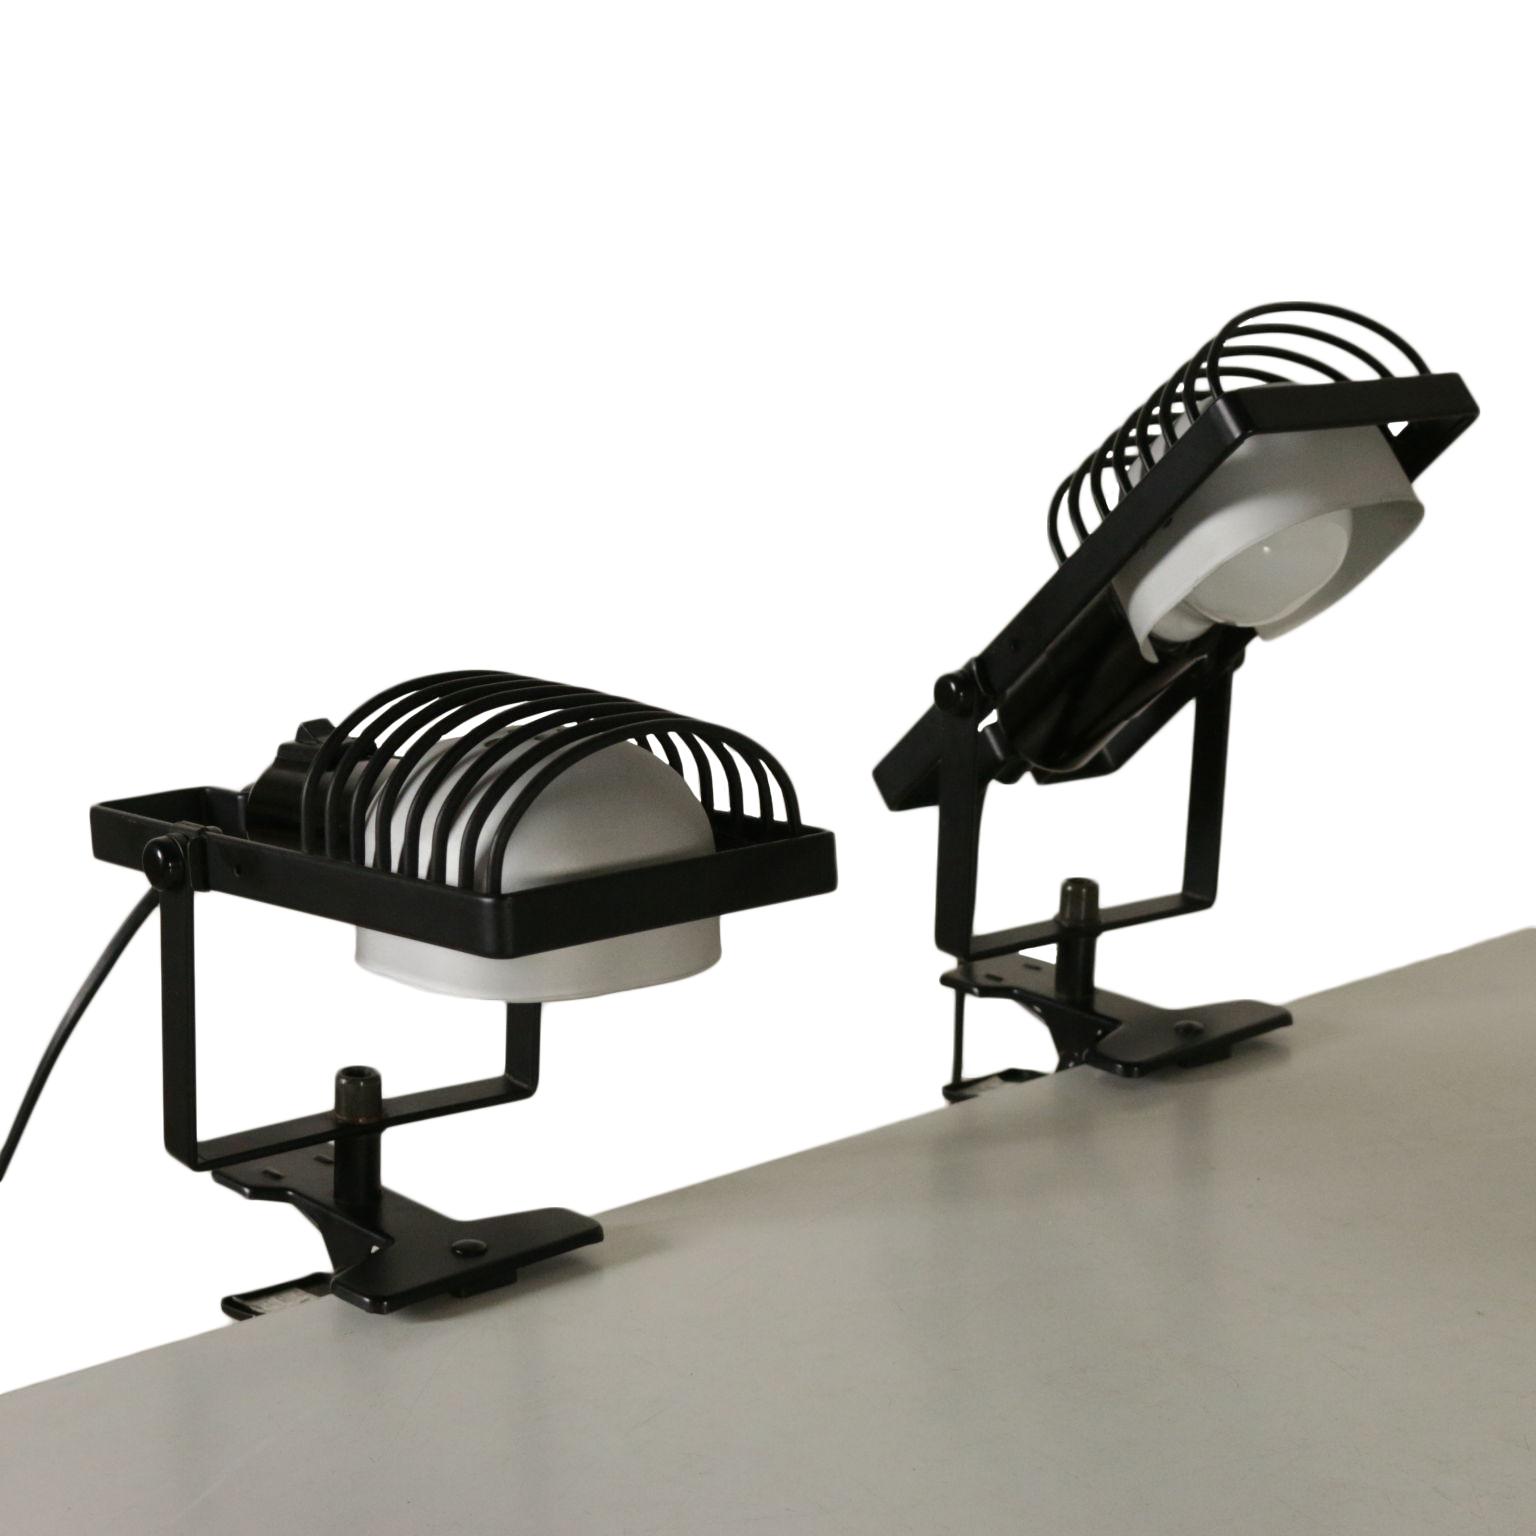 Lampade sintesi illuminazione modernariato for Lampade modernariato